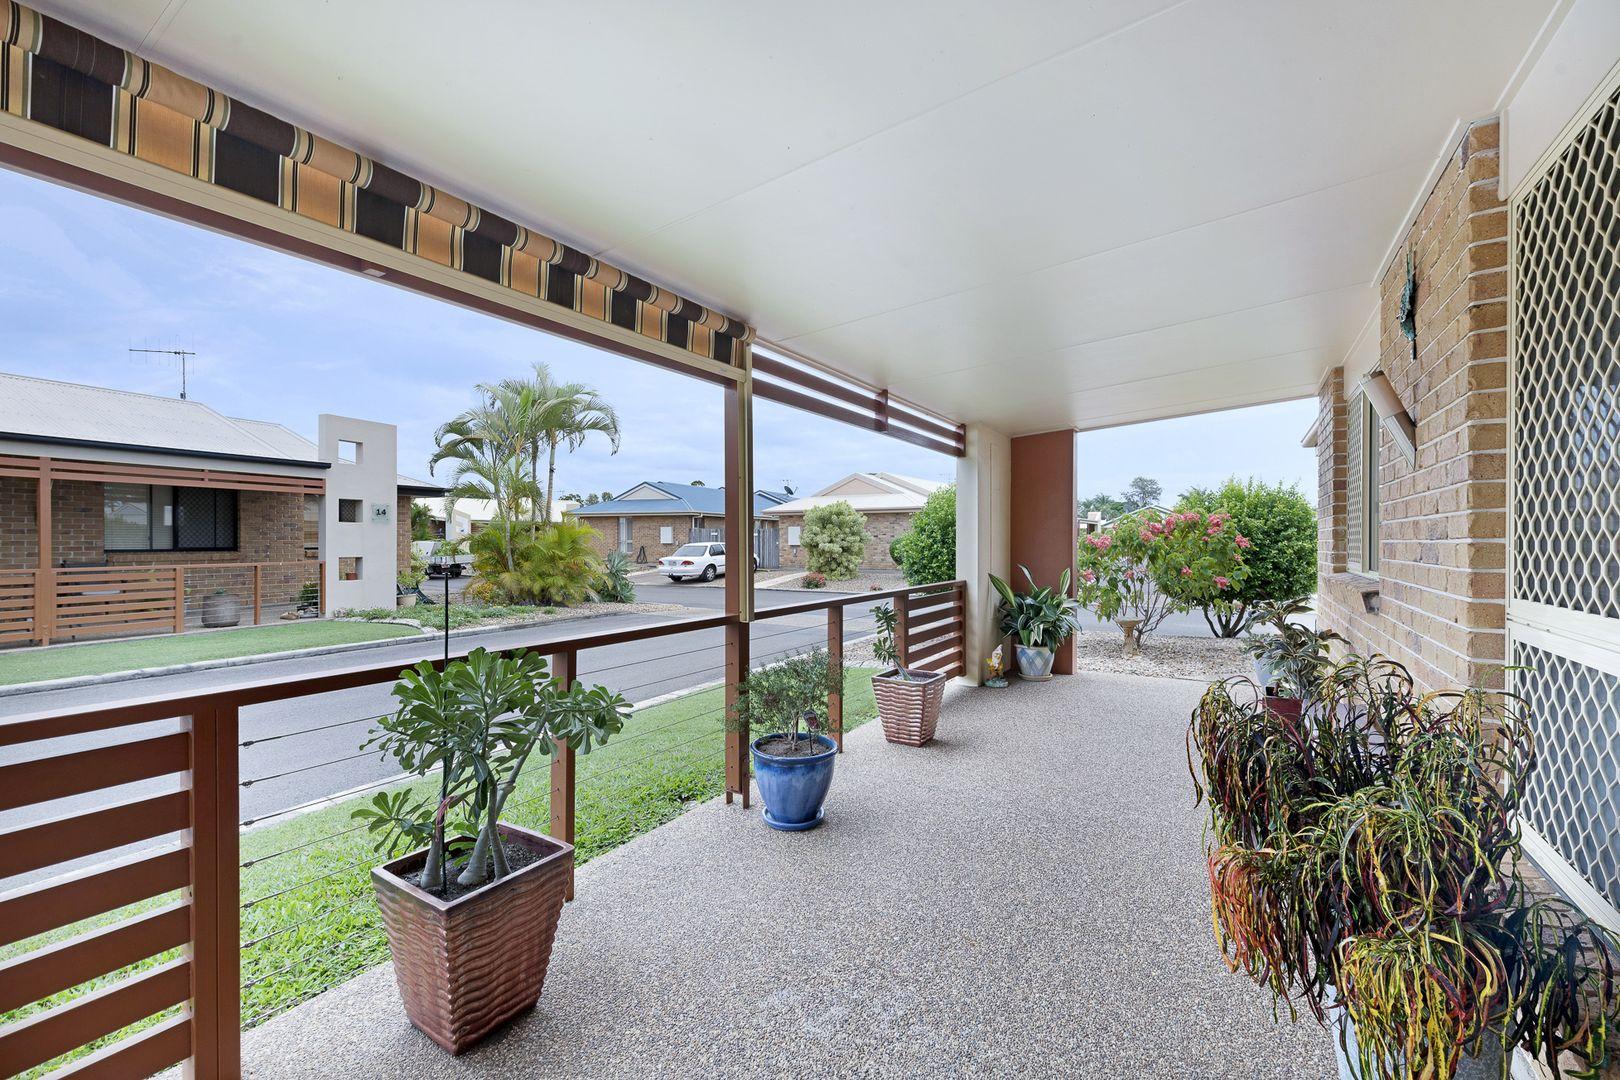 11/12 Morshead Street, Avenell Heights QLD 4670, Image 0